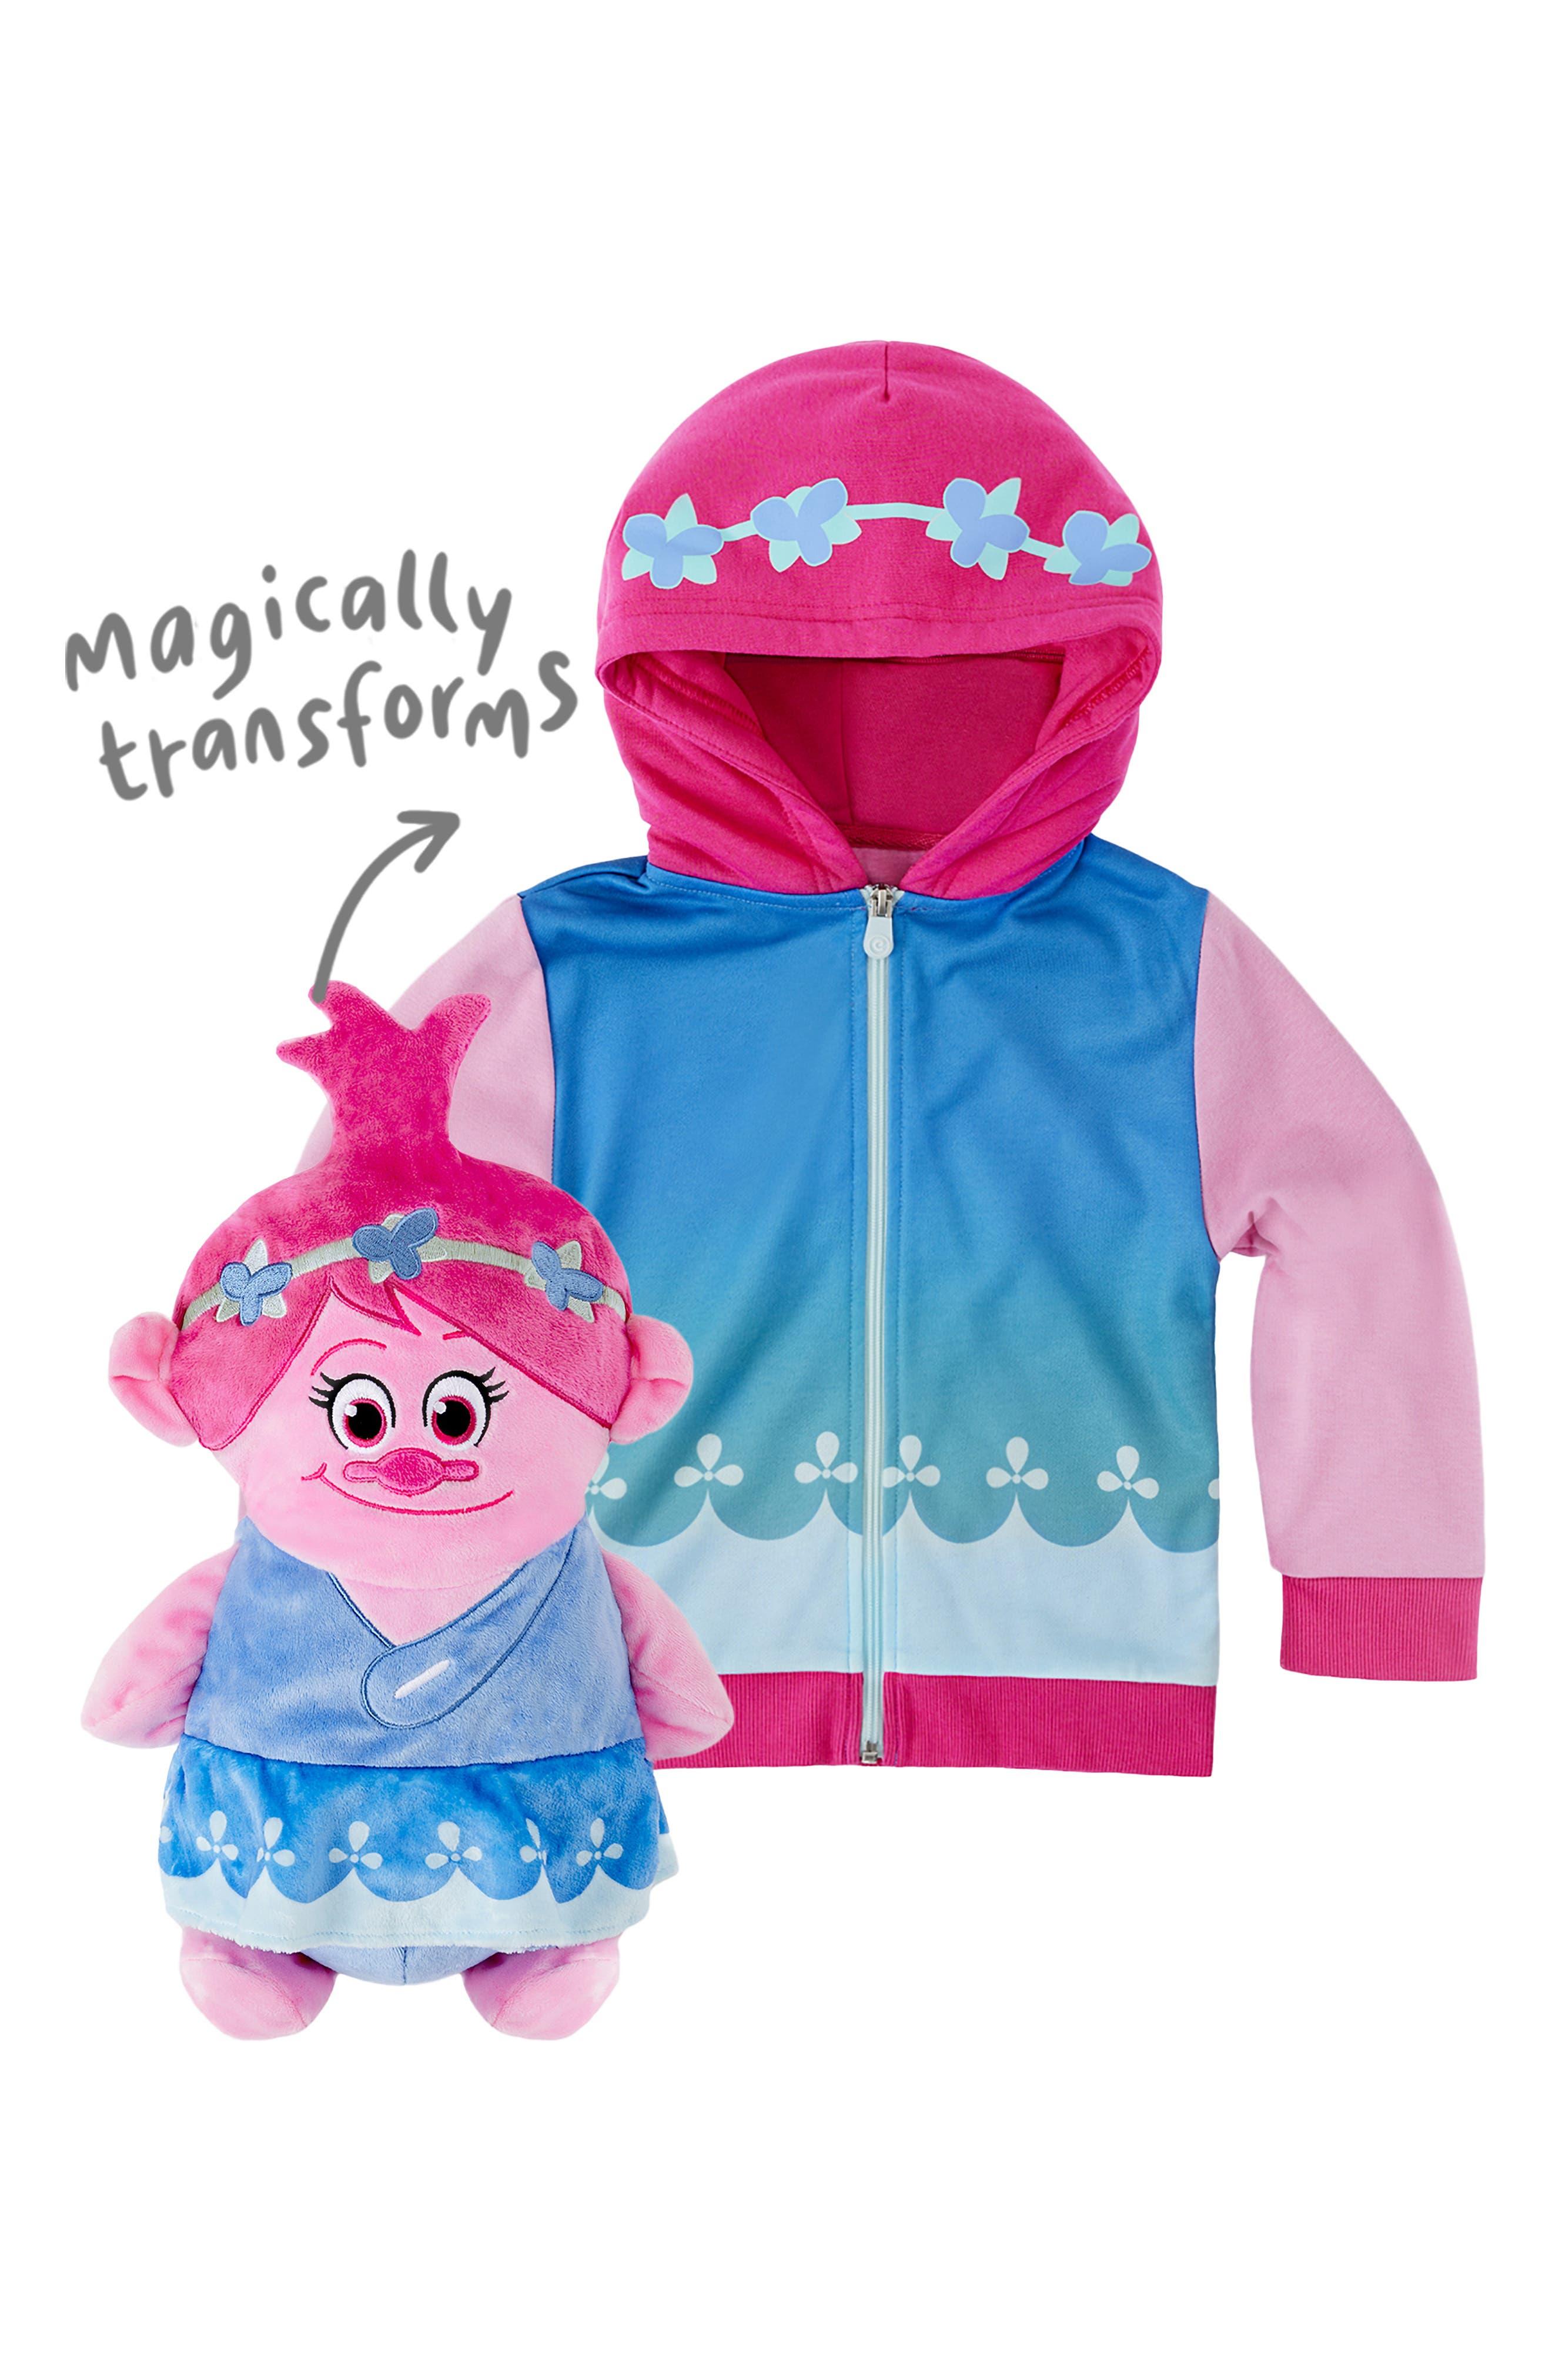 DreamWorks Trolls Poppy 2-in-1 Stuffed Animal Hoodie,                             Alternate thumbnail 3, color,                             PINK MIX